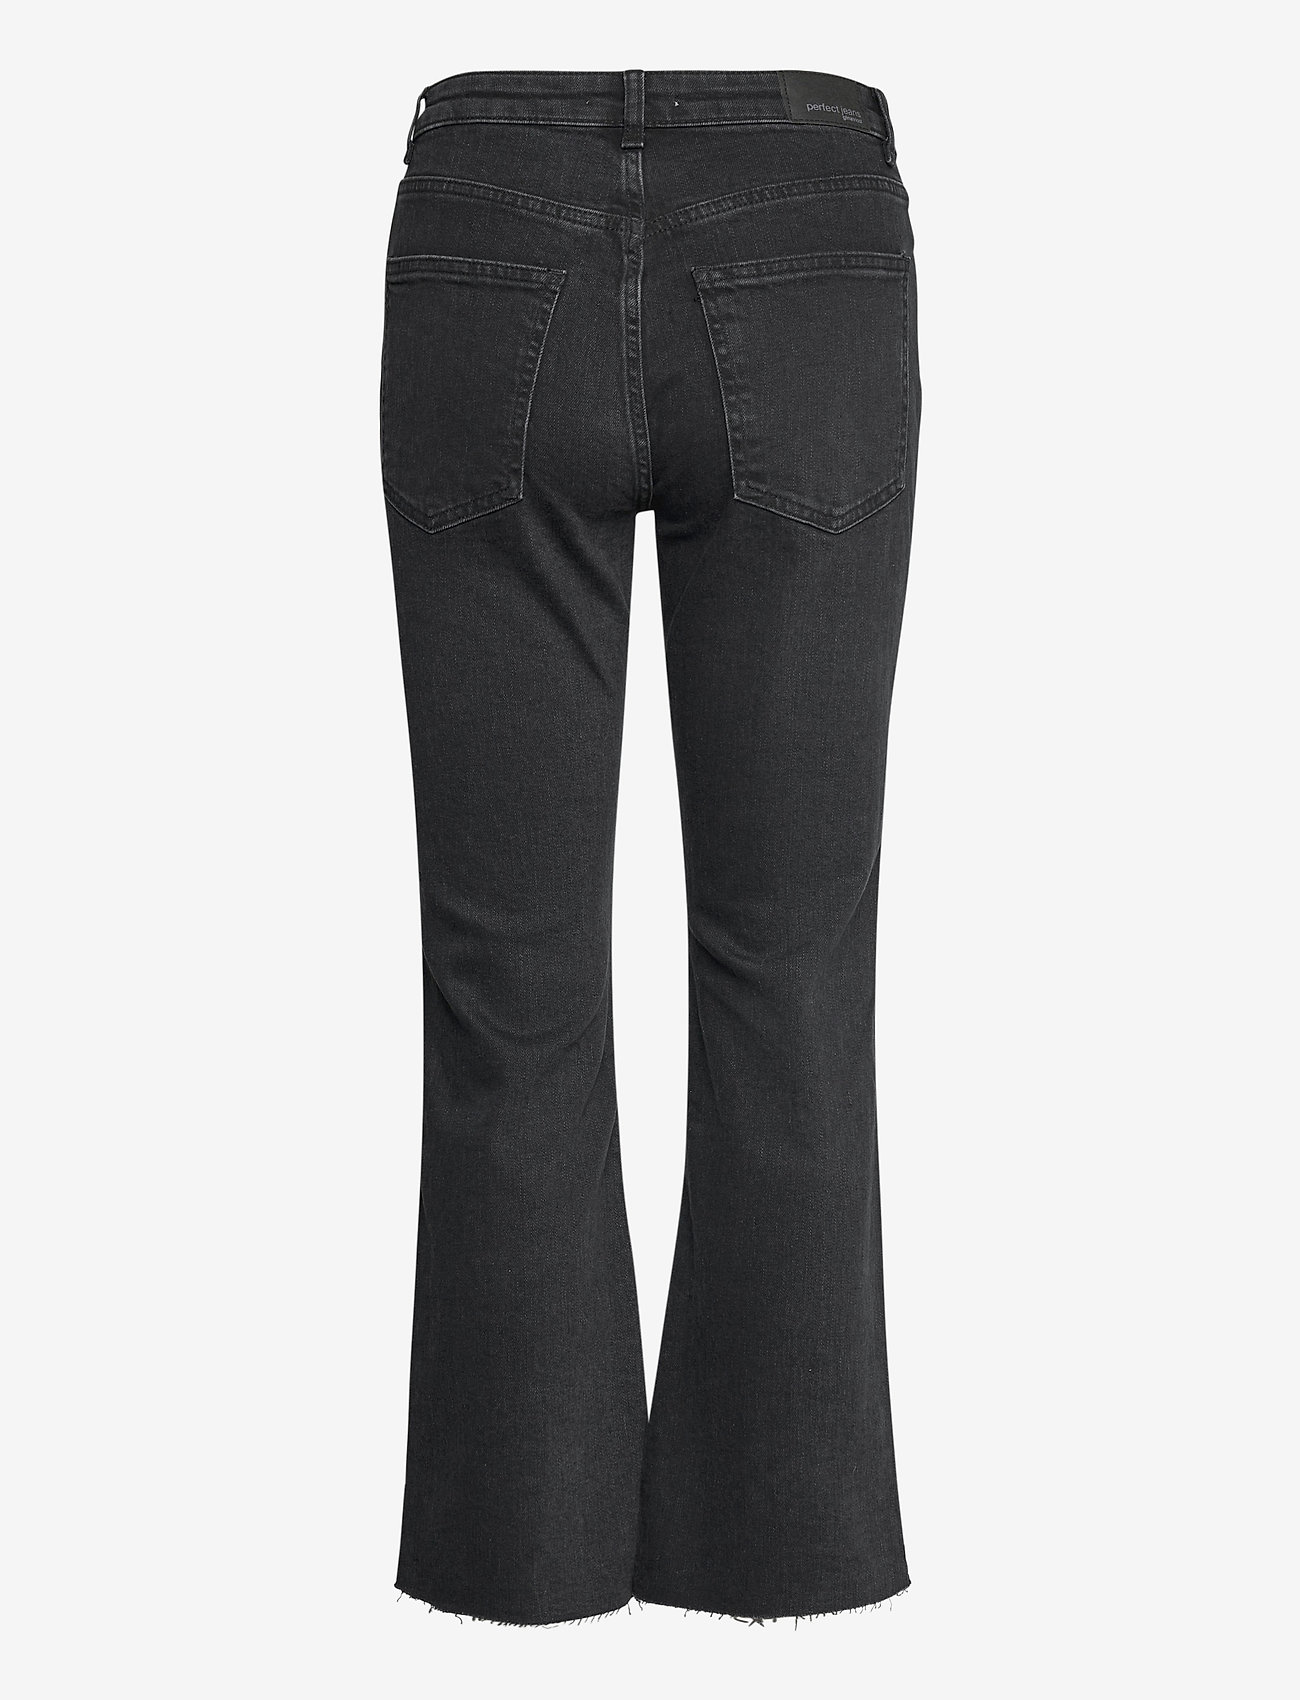 Gina Tricot - Ylva kick flare jeans - schlaghosen - offblack - 1